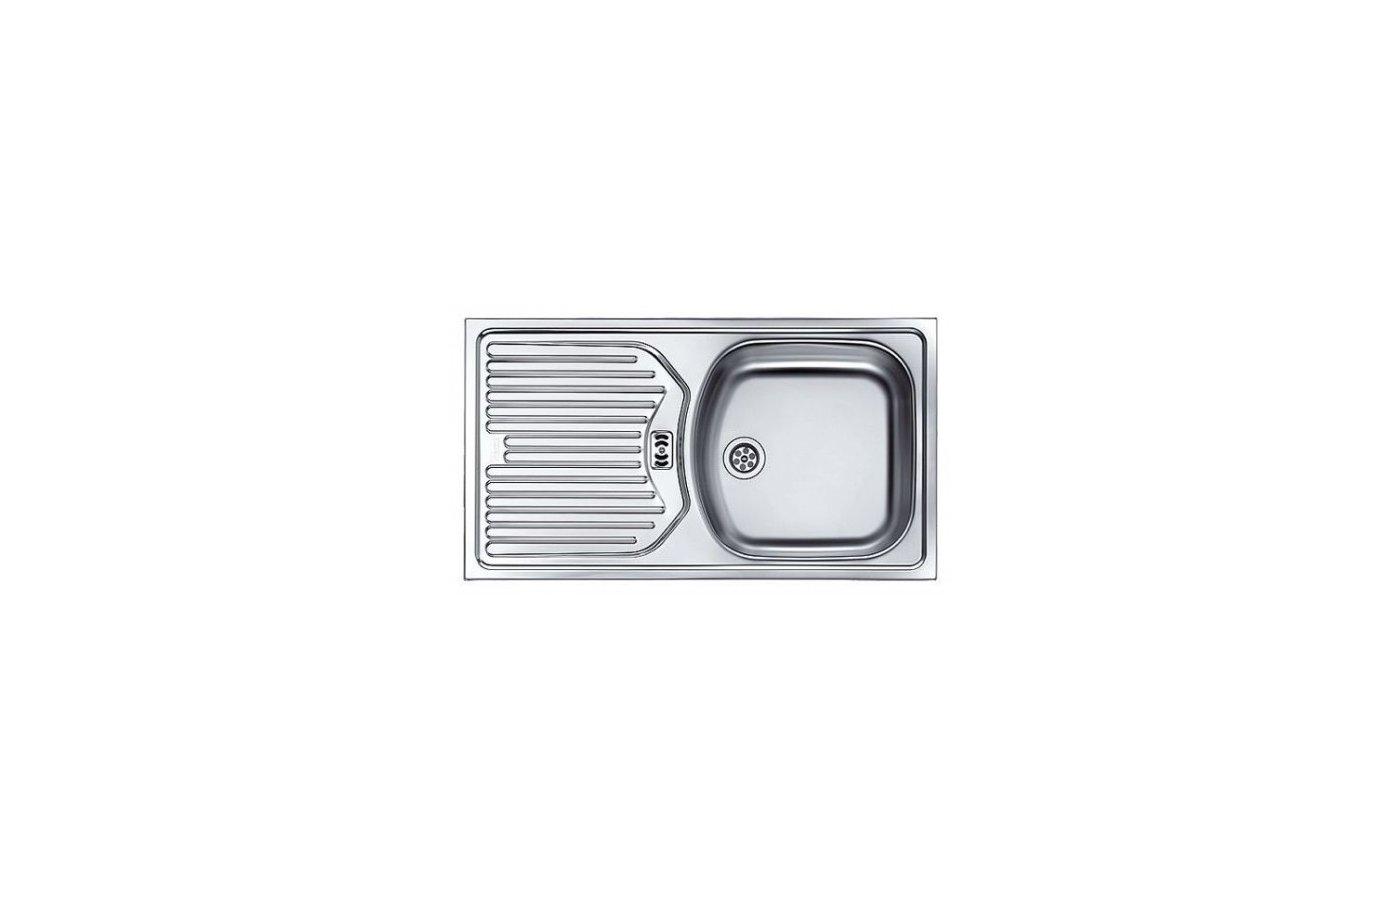 Кухонная мойка FRANKE ETN 614 Вентиль 1.5 + комплект для монтажа